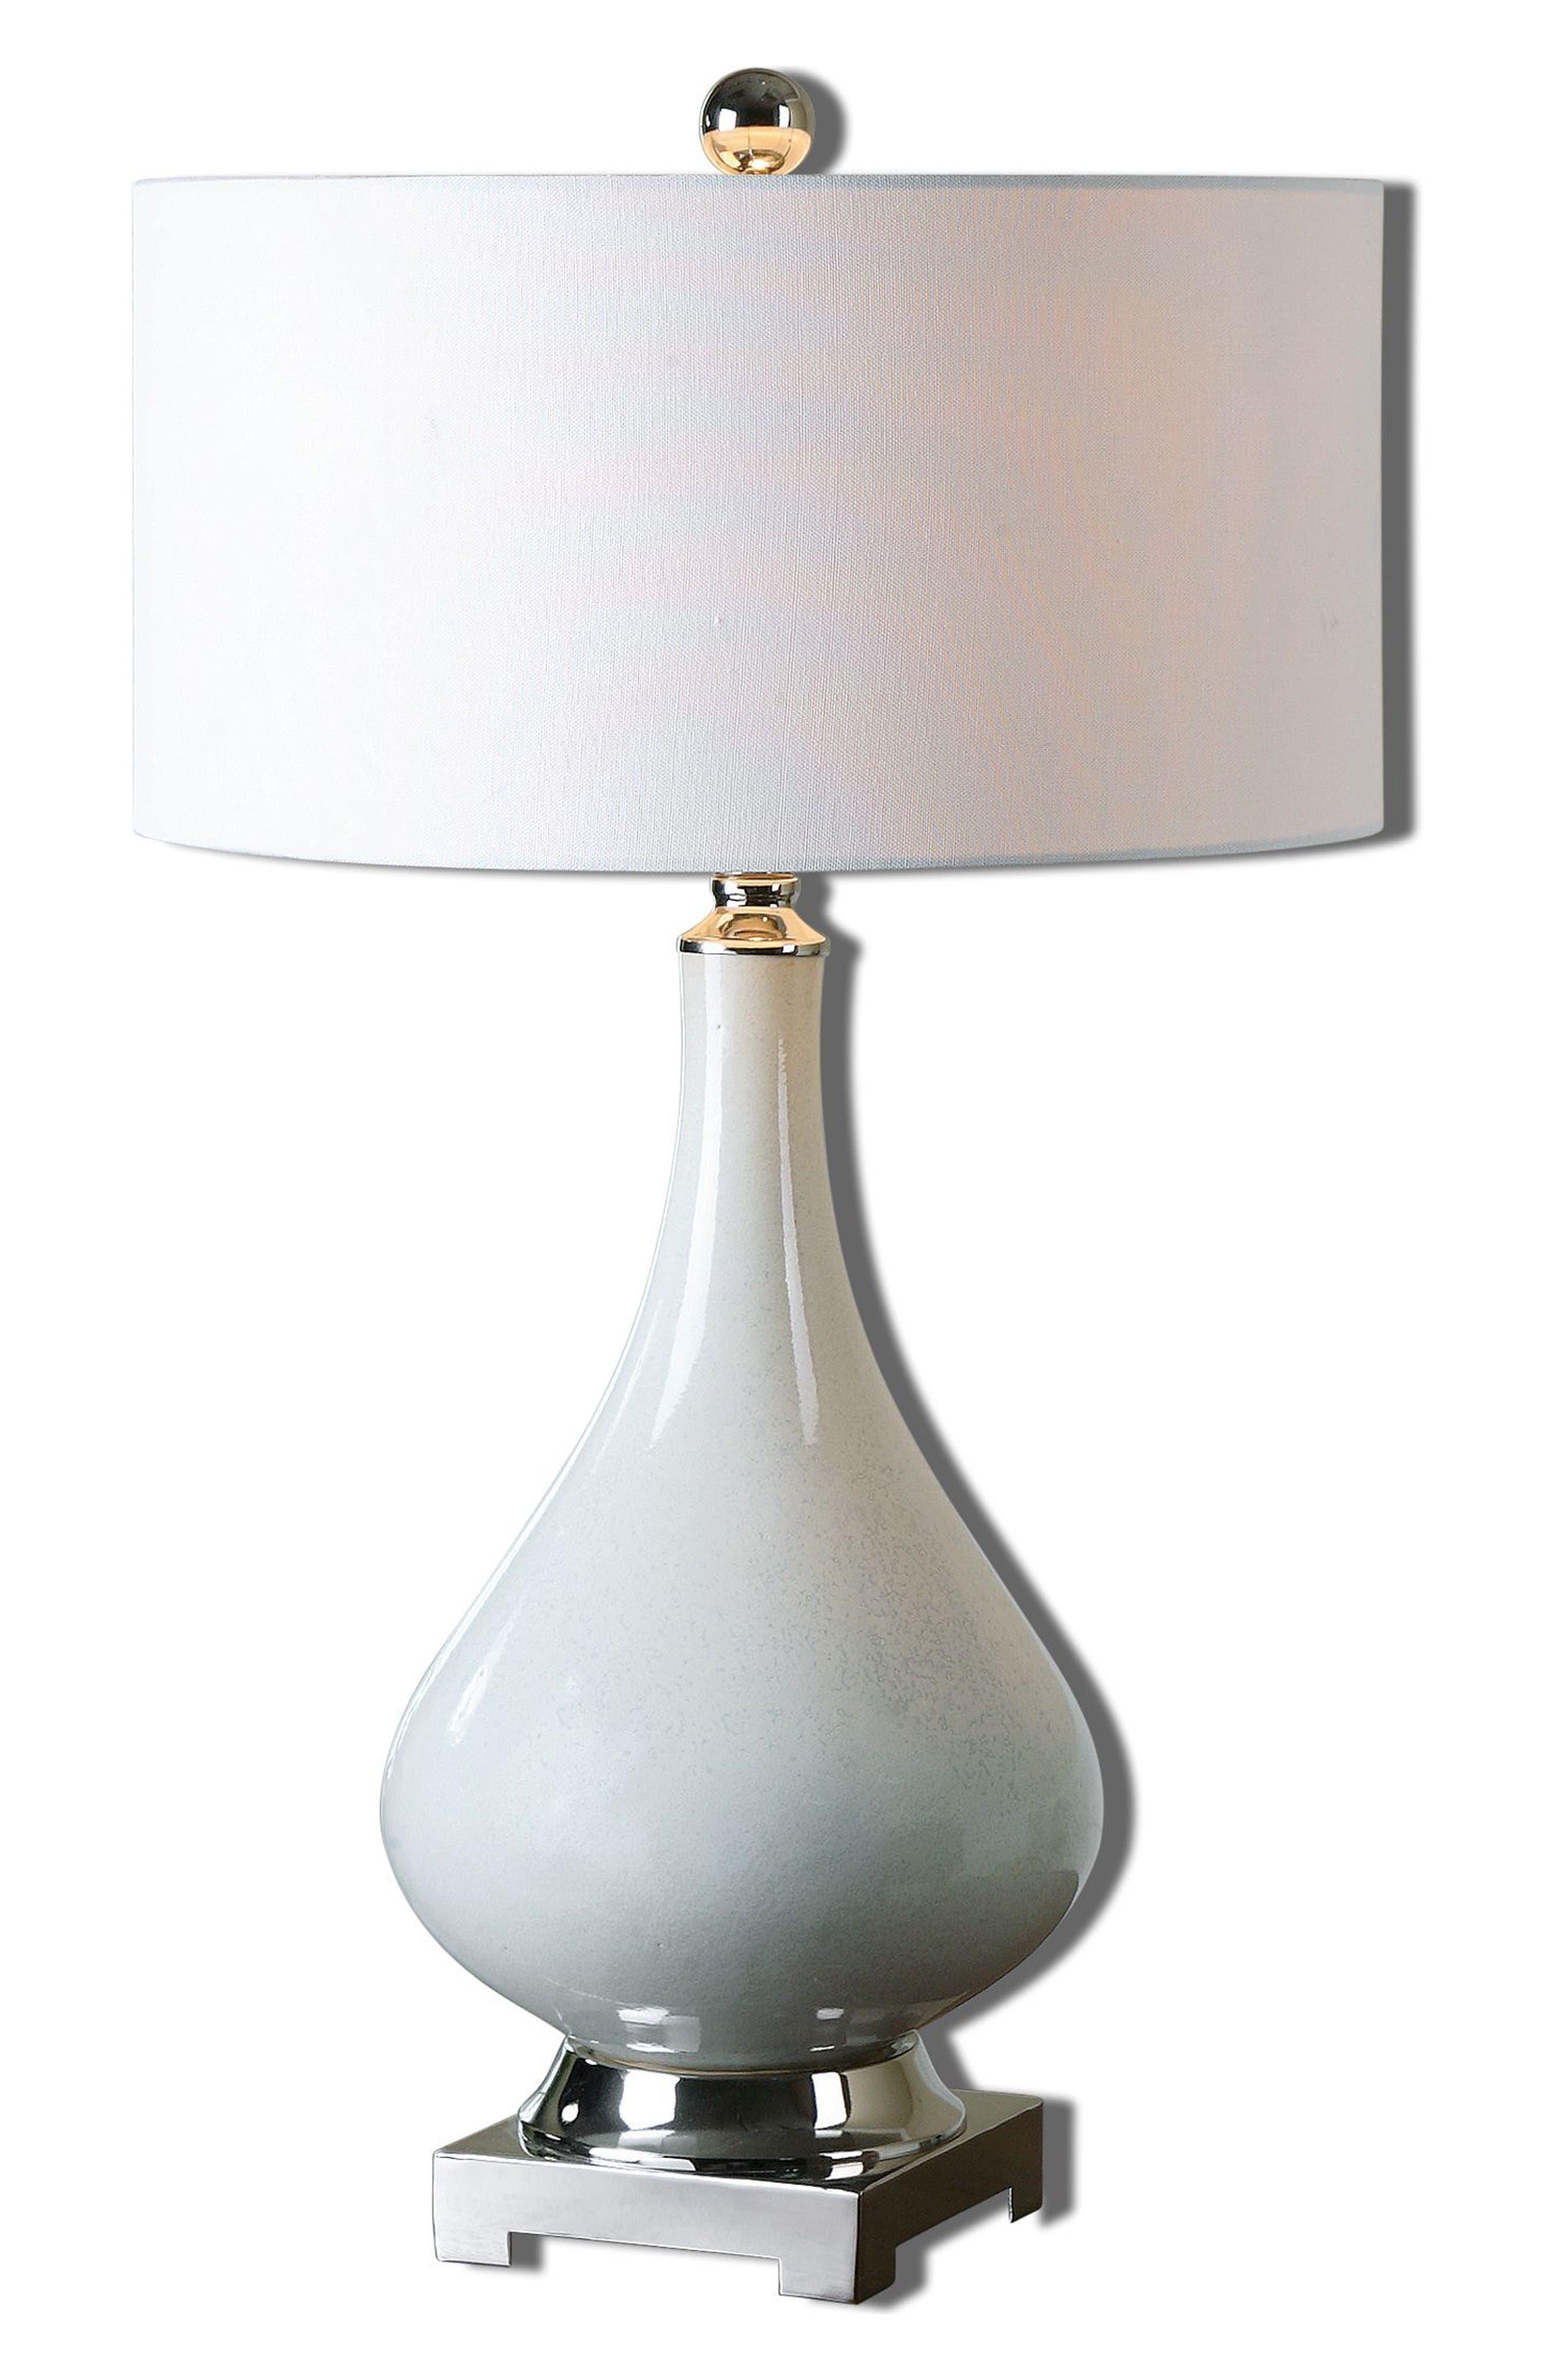 Alternate Image 1 Selected - Uttermost Helton Table Lamp